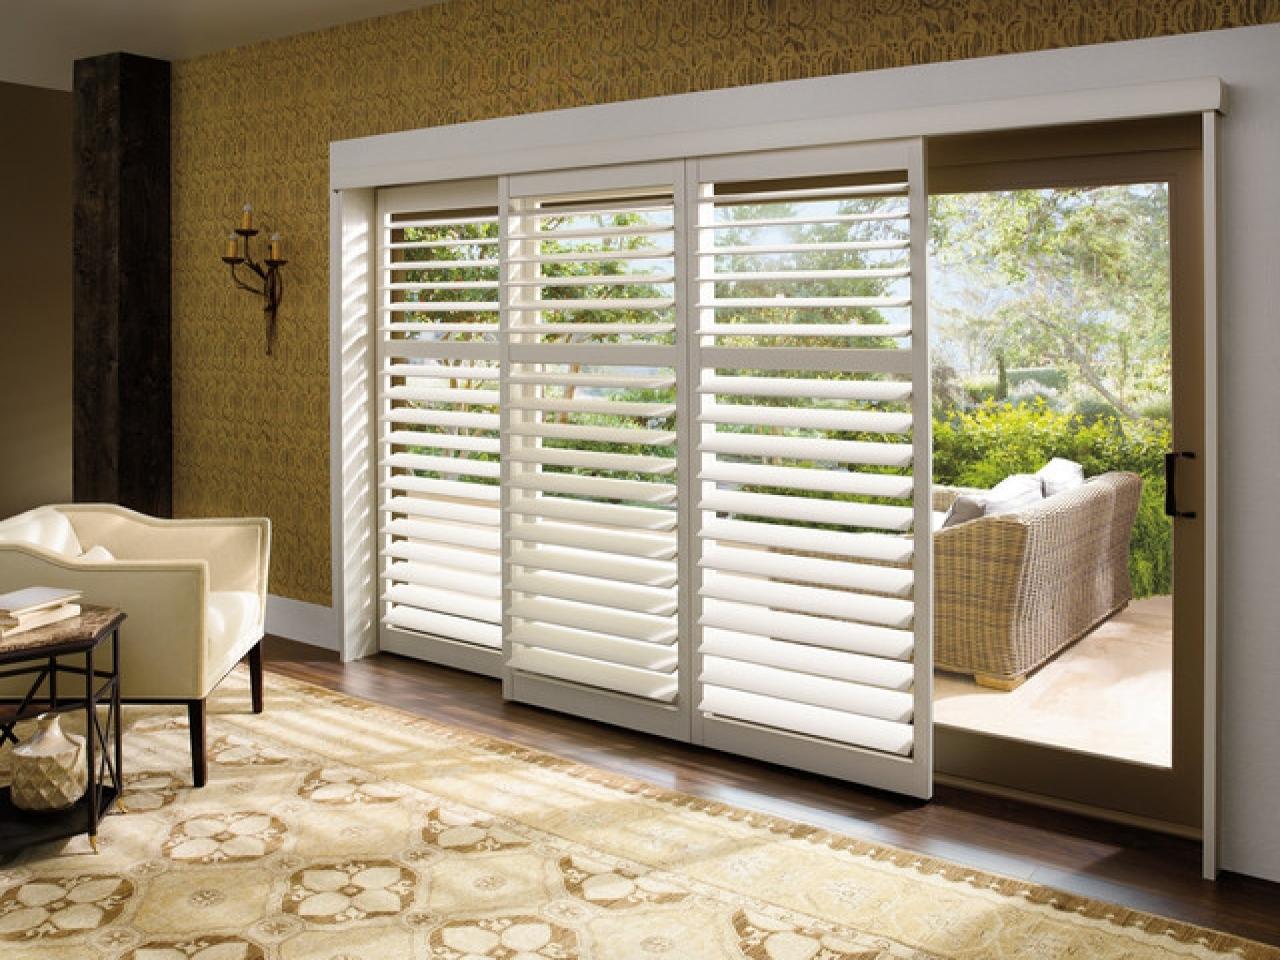 Sliding Glass Door Coveringswindow treatments for sliding glass doors ideas tips